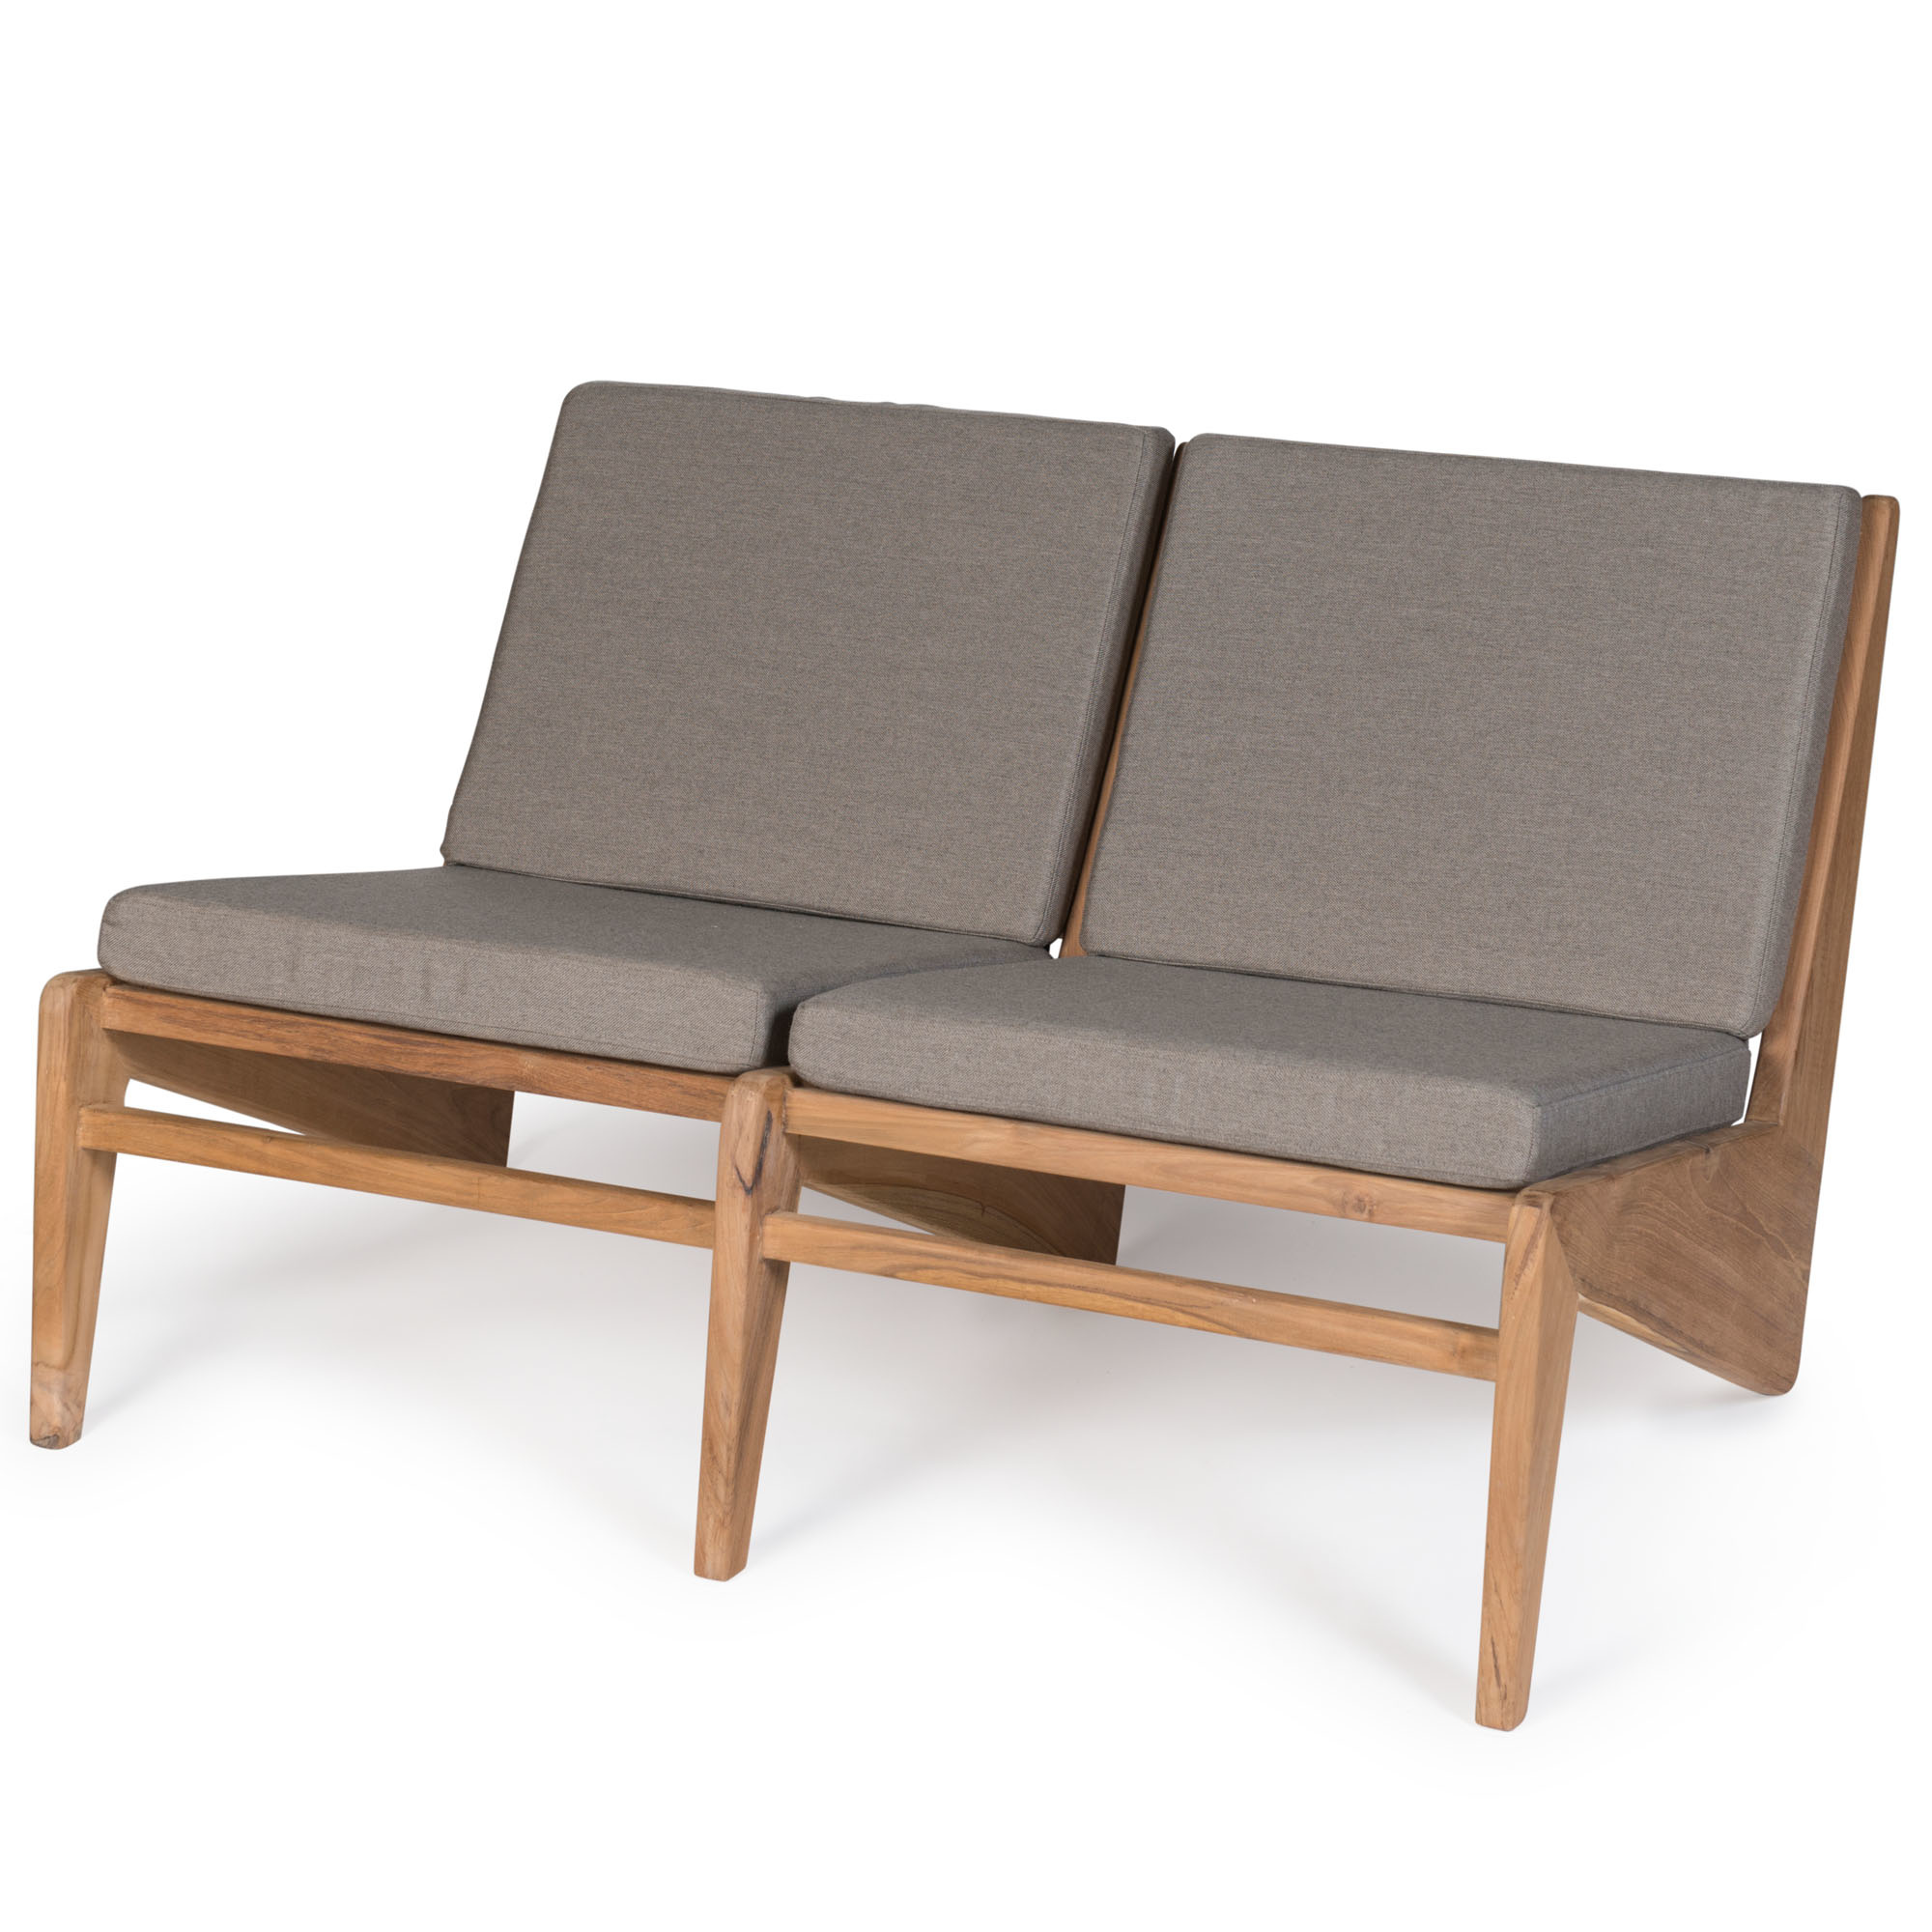 Kangaroo Chair  Bench 2 - Teak Outdoor with Cushion-1